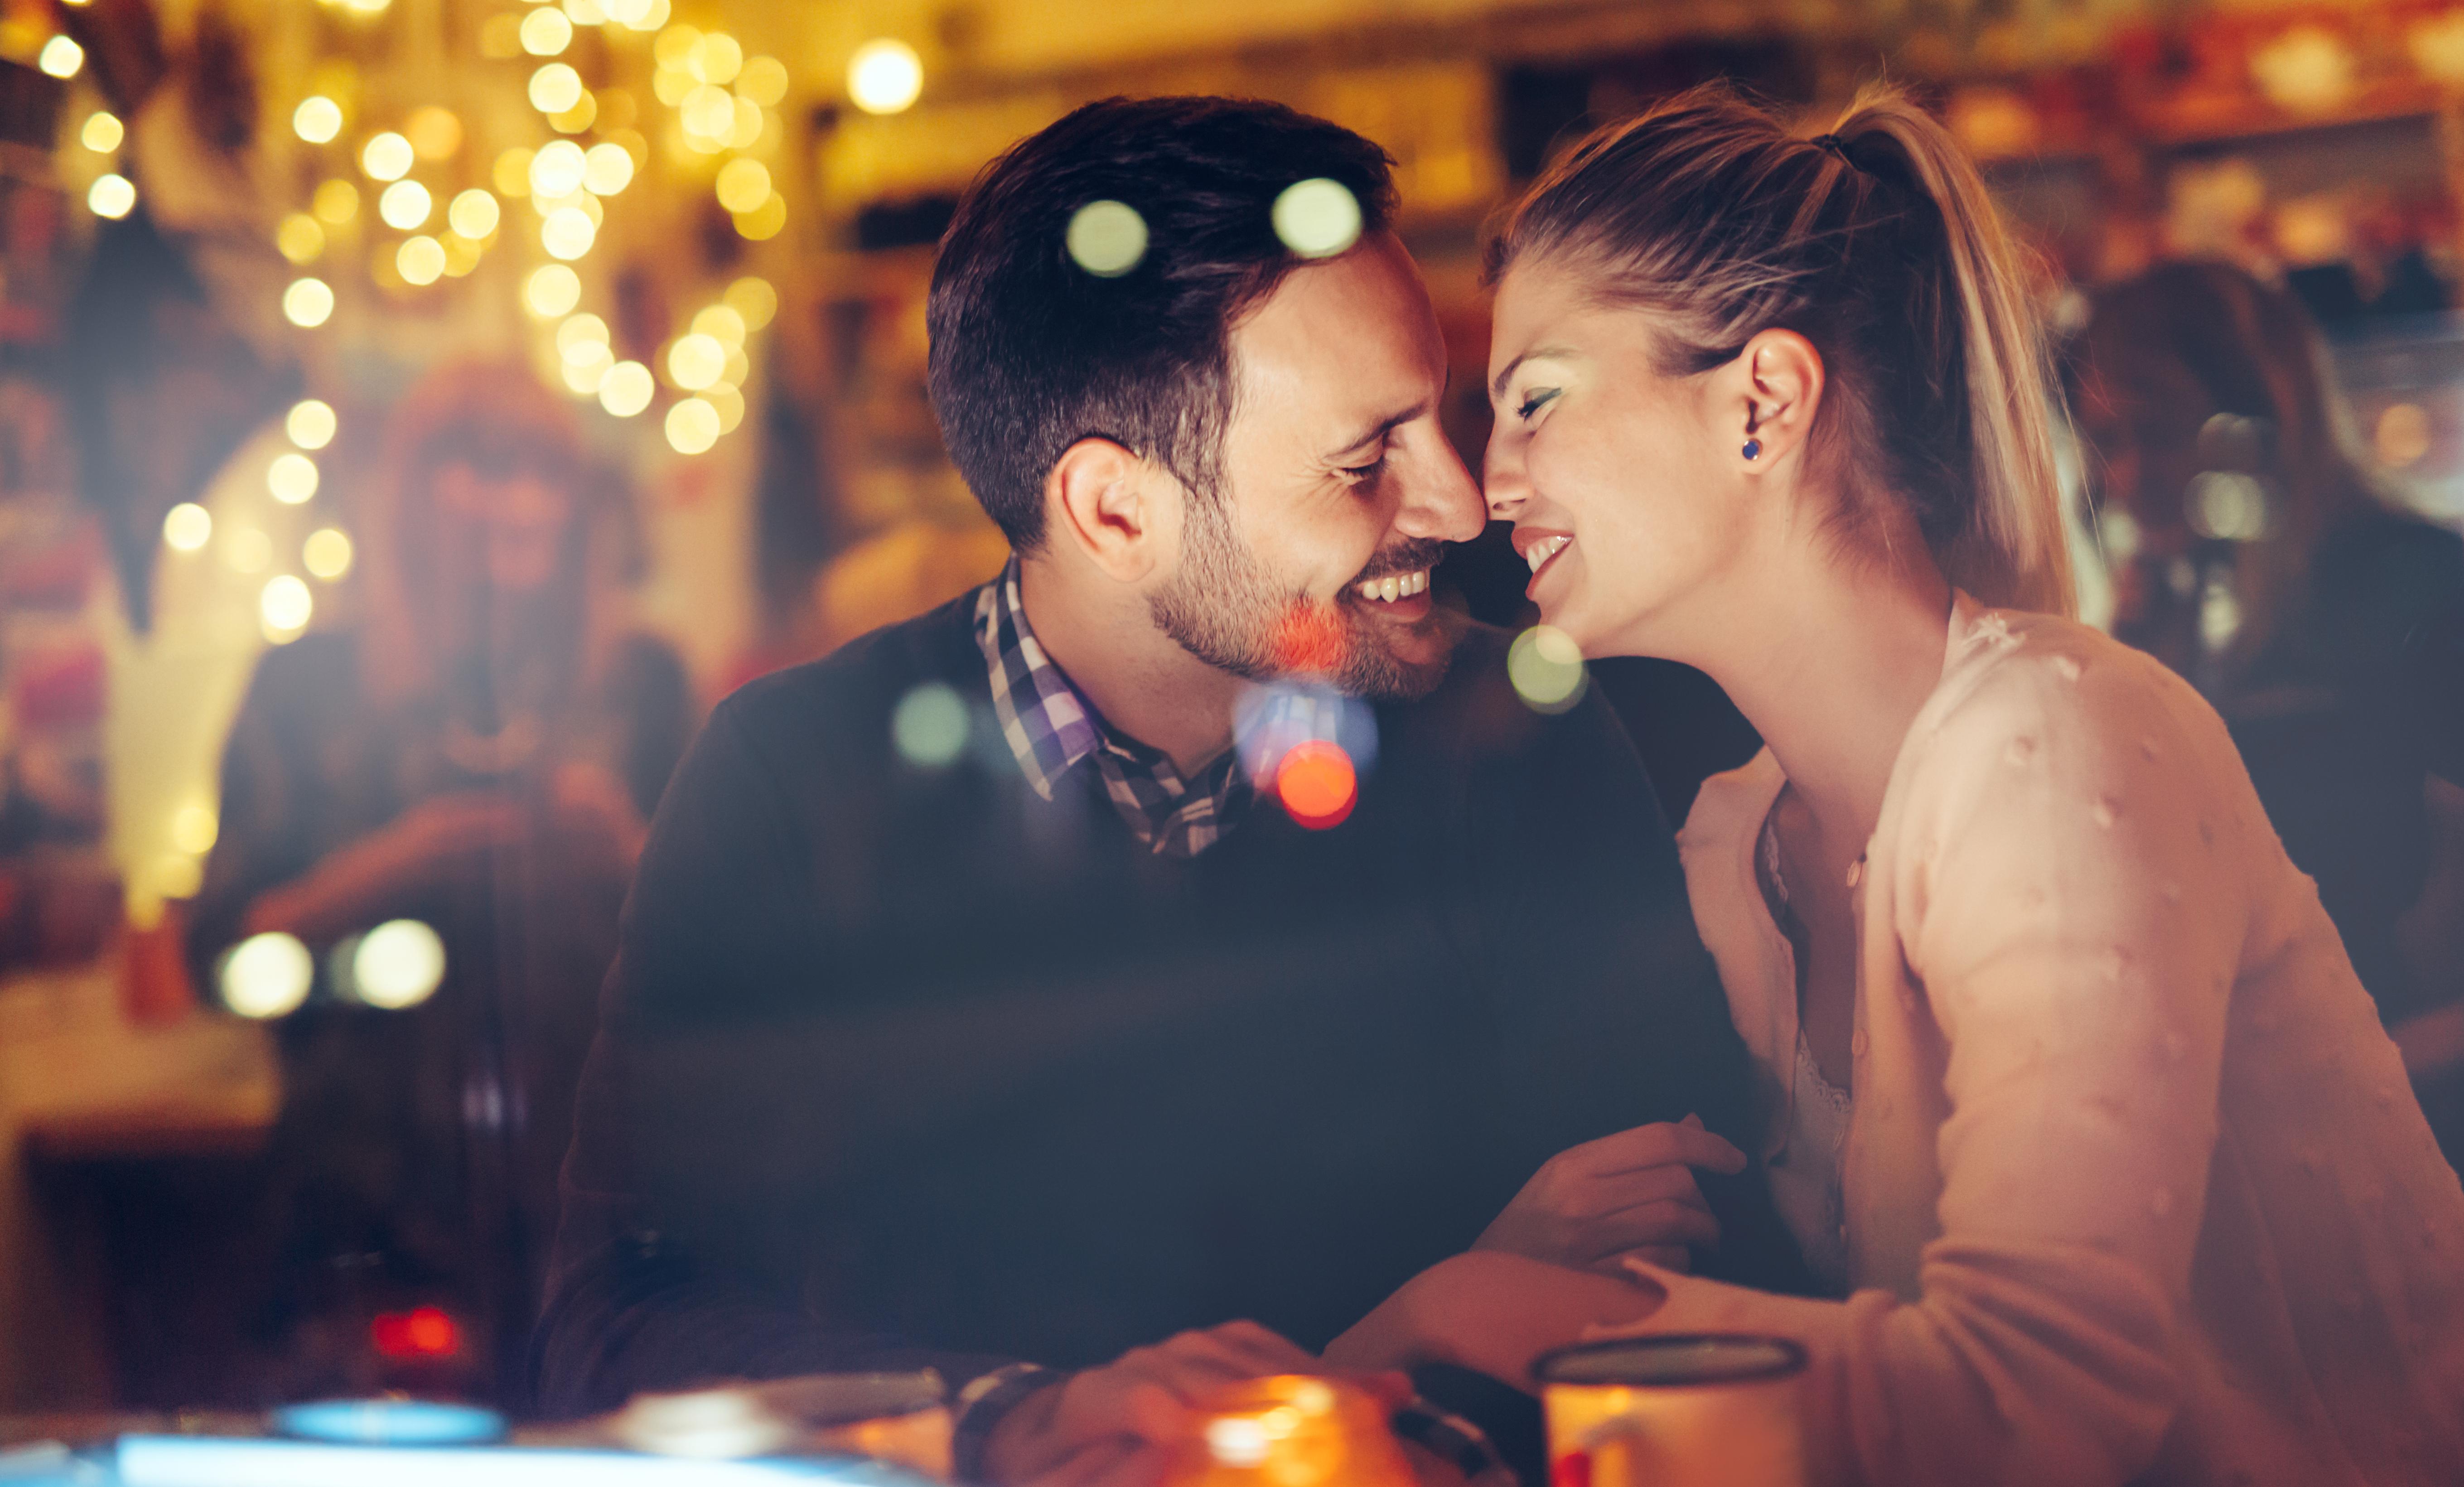 Los angeles speed dating události